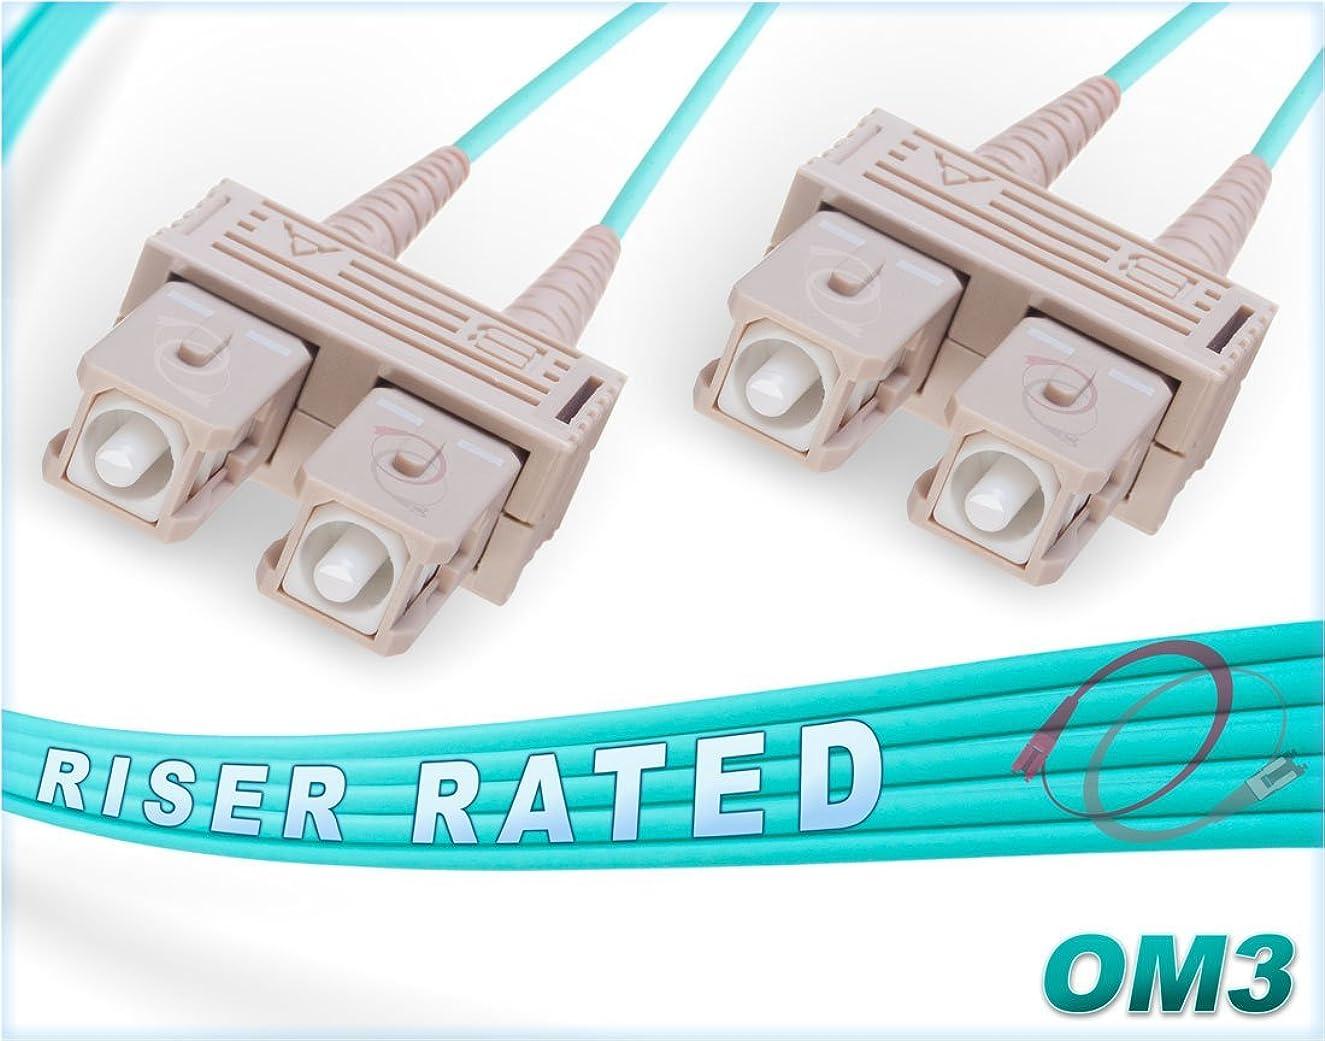 FiberCablesDirect - 10M OM3 SC SC Fiber Patch Cable   10Gb Duplex 50/125 SC to SC Multimode Jumper 10 Meter (32.8ft)   Length Options: 0.5M-300M   ofnr sc-sc dplx mmf 10gbase sfp+ sr Aqua Zip-Cord